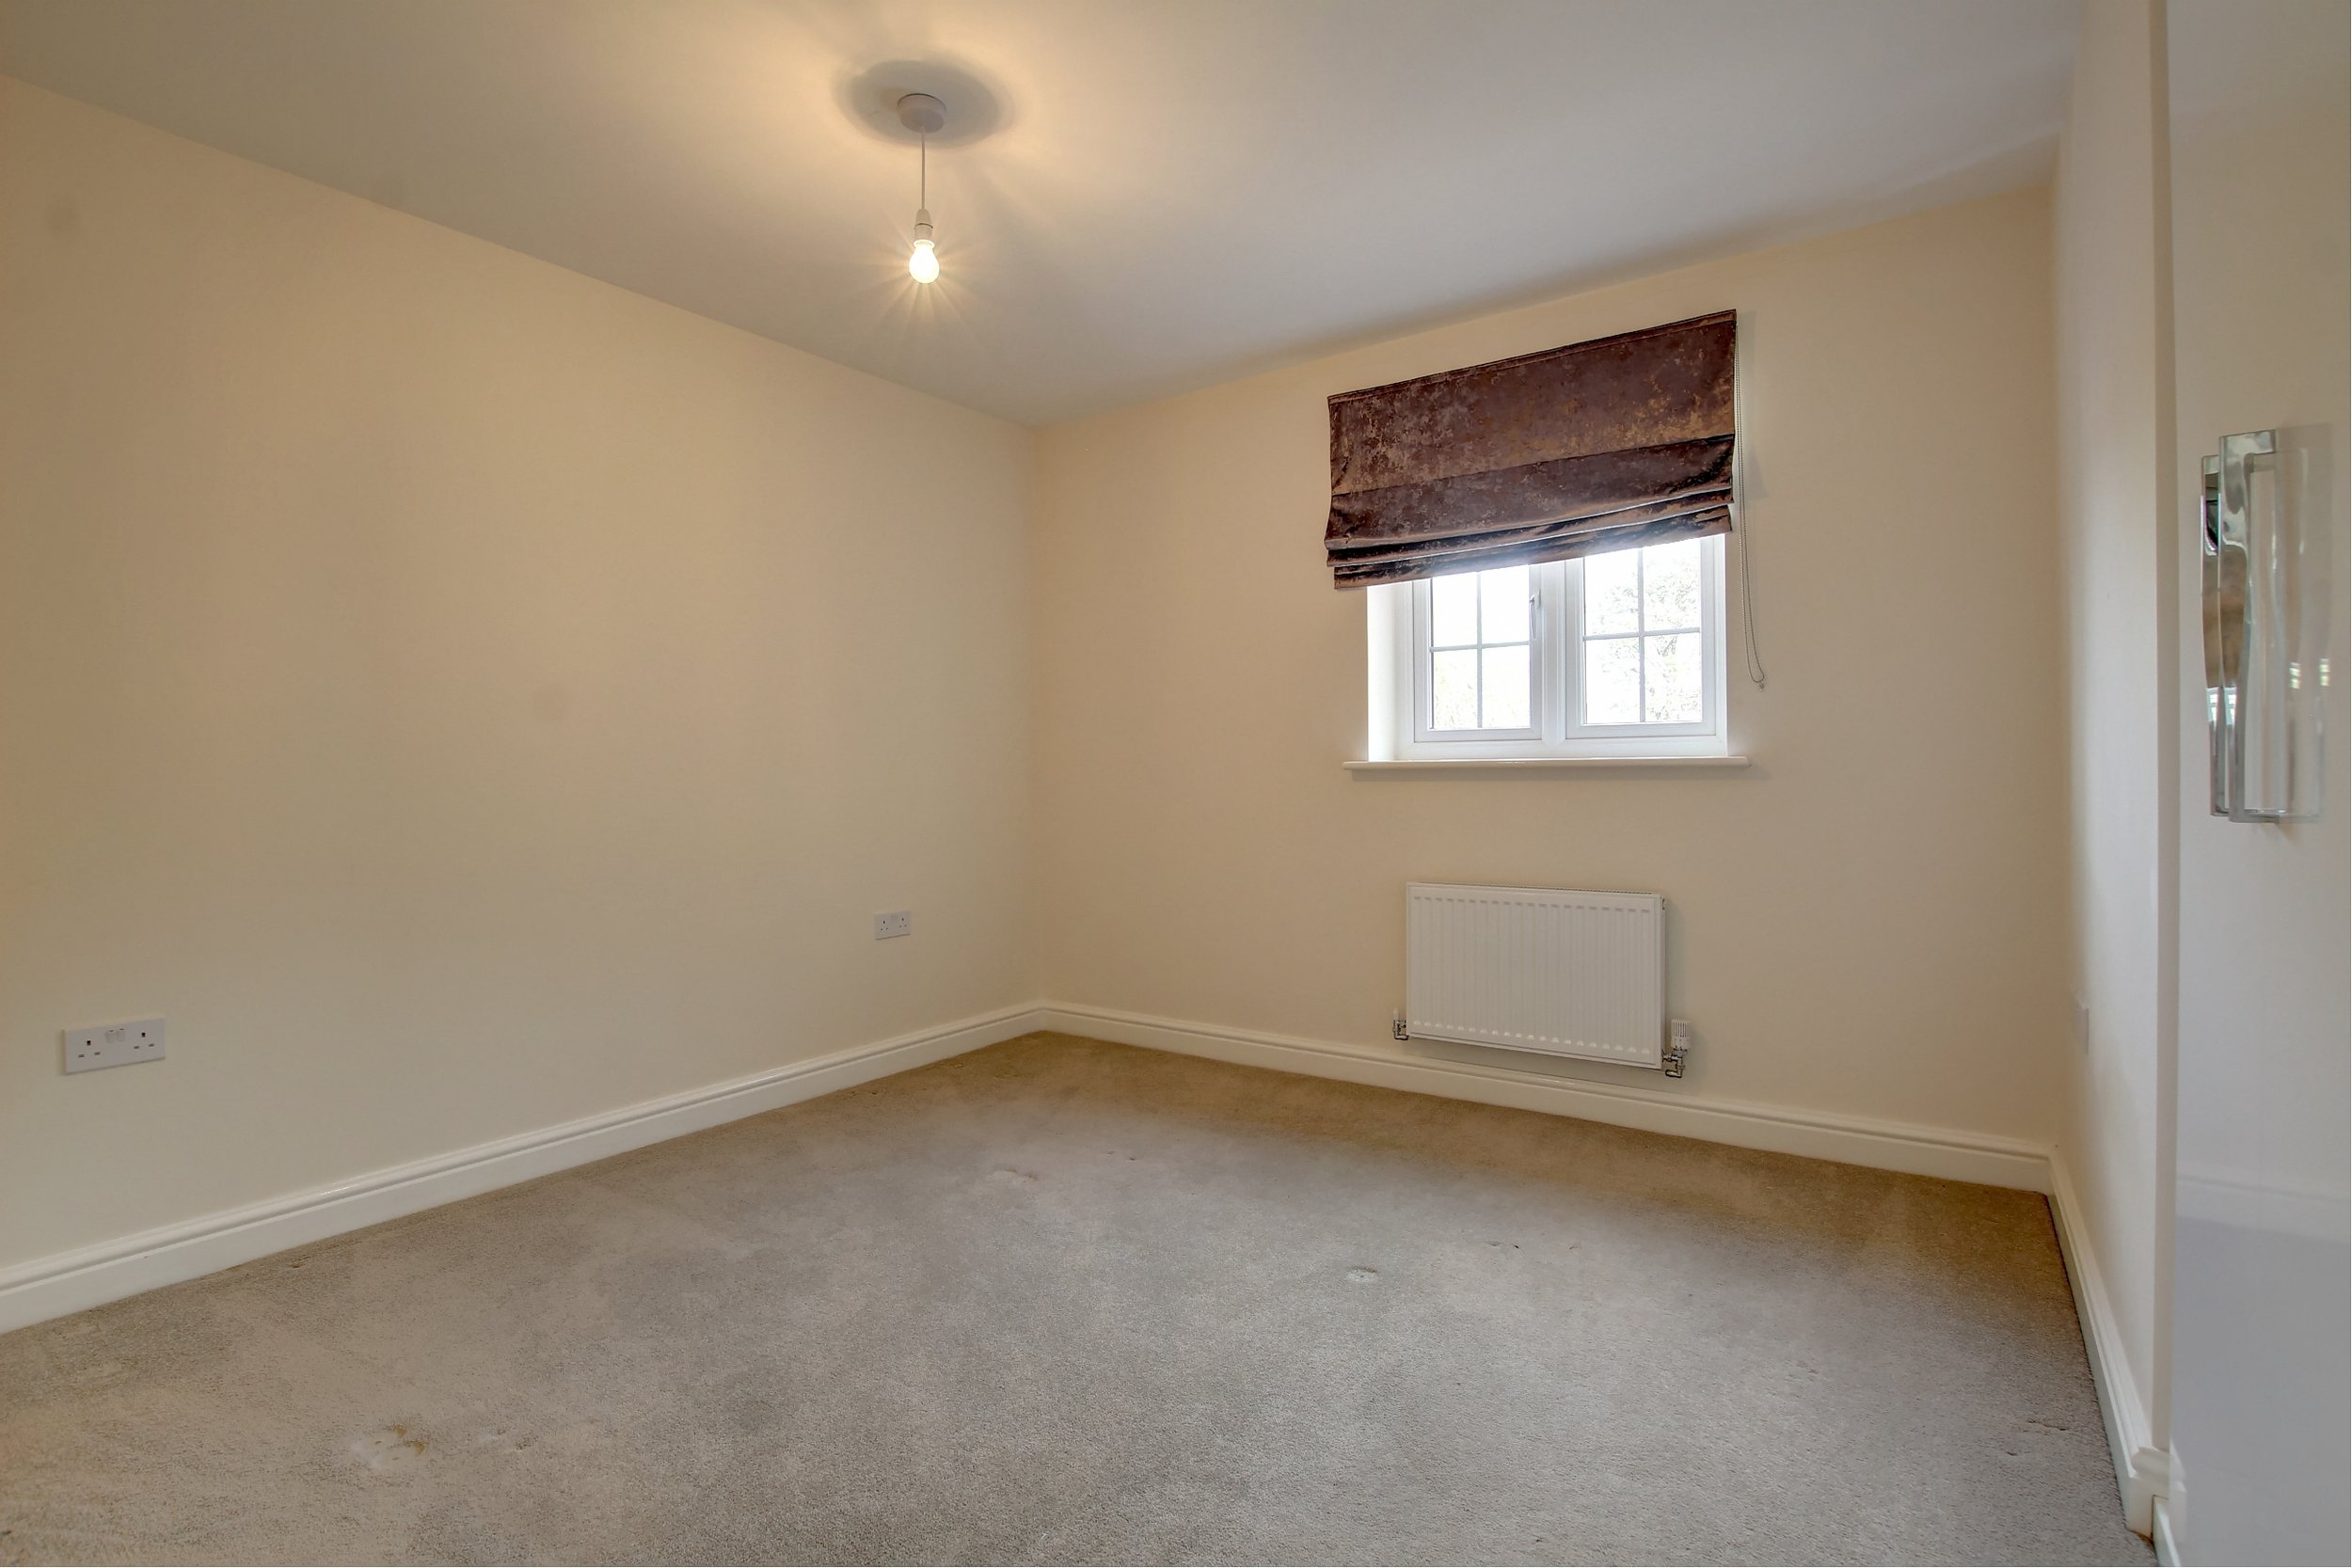 16 bedroom.jpg